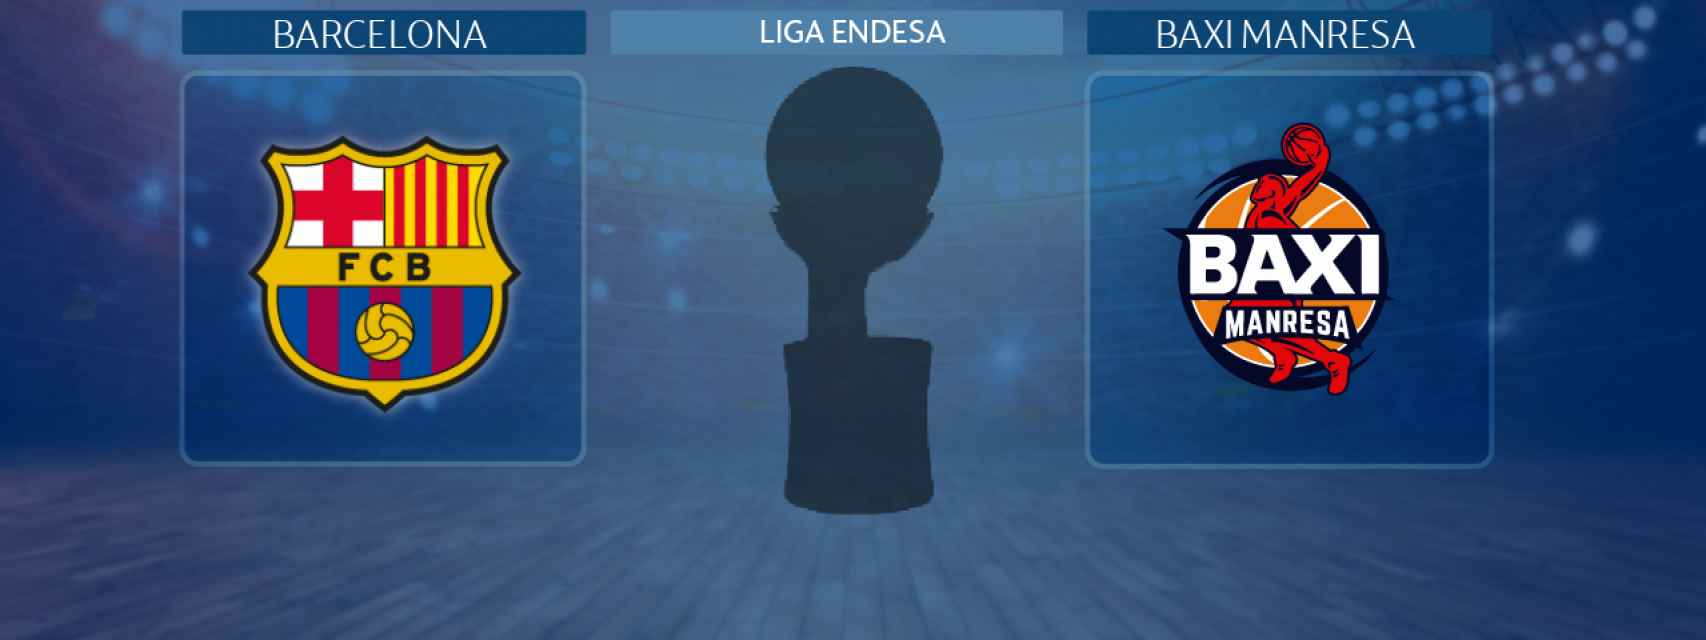 Barcelona - Baxi Manresa, partido de la Liga Endesa